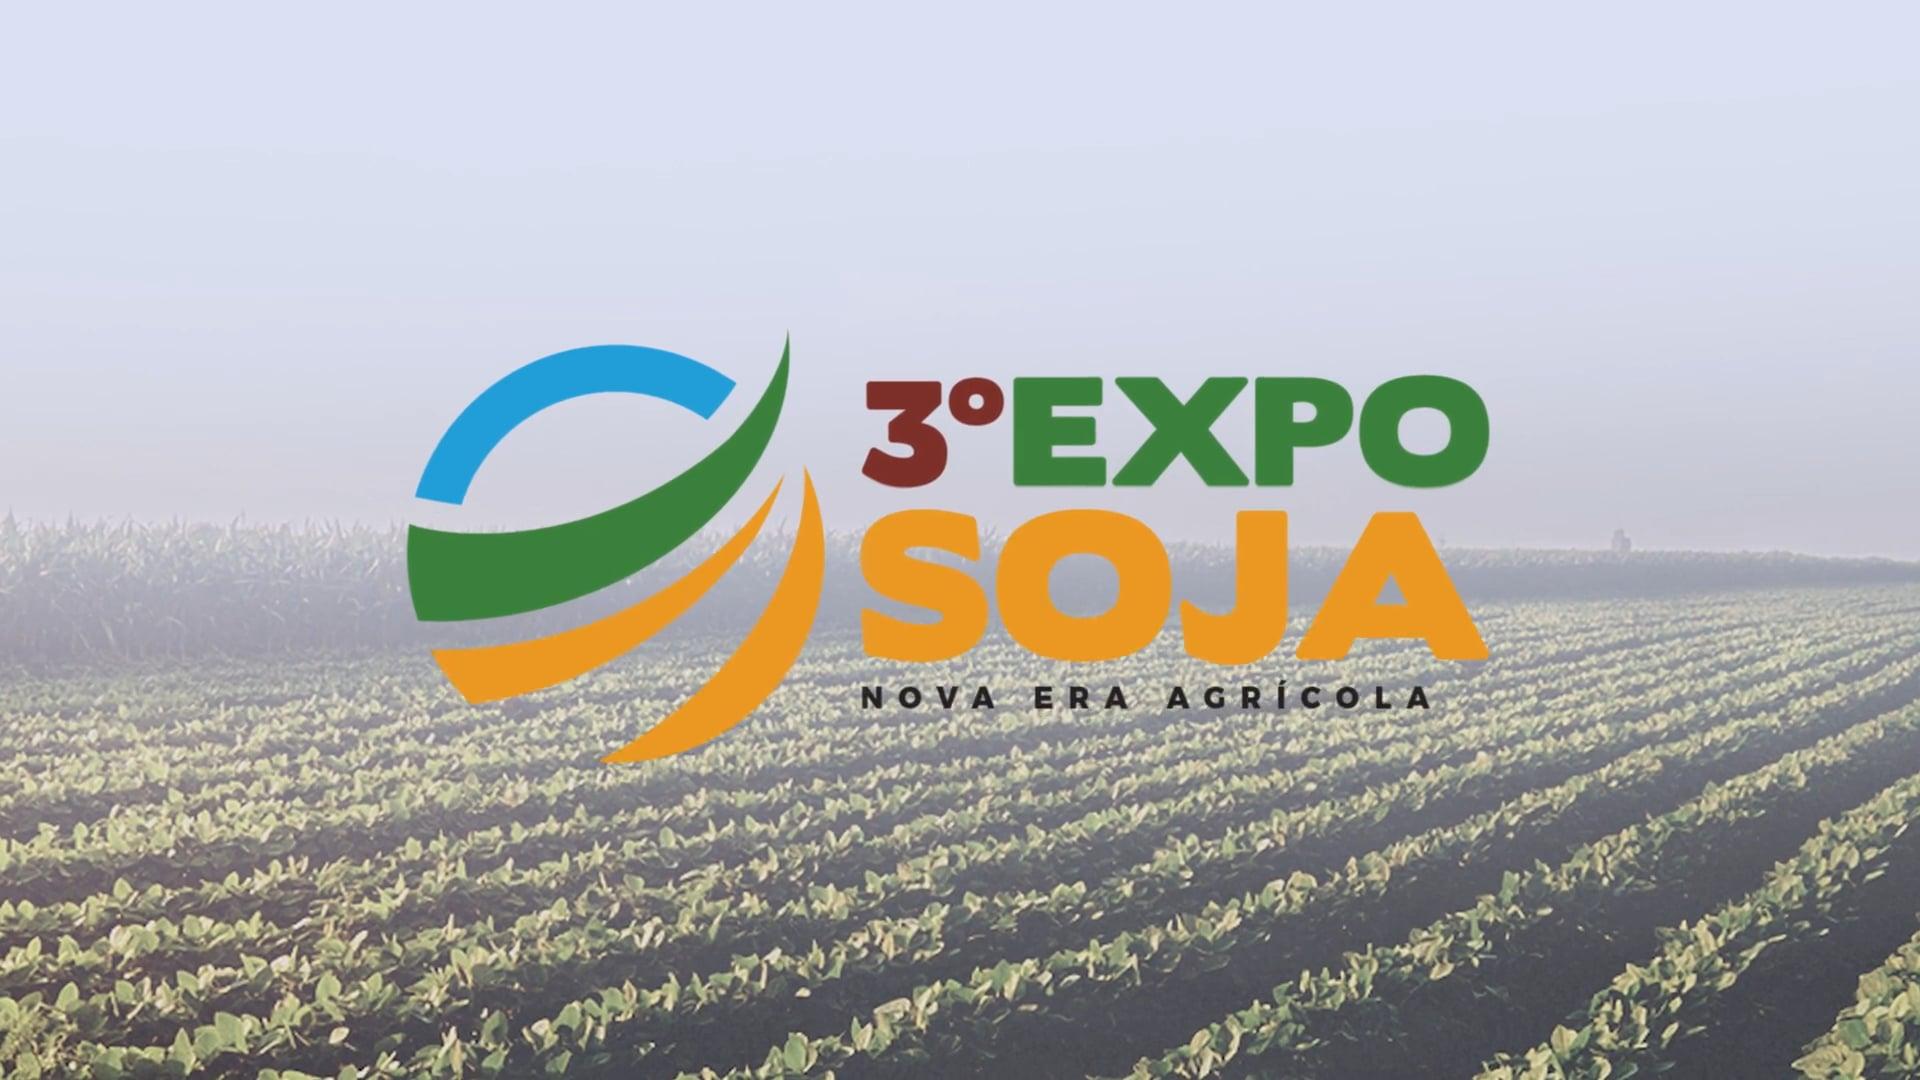 Exposoja Nova Era Agrícola